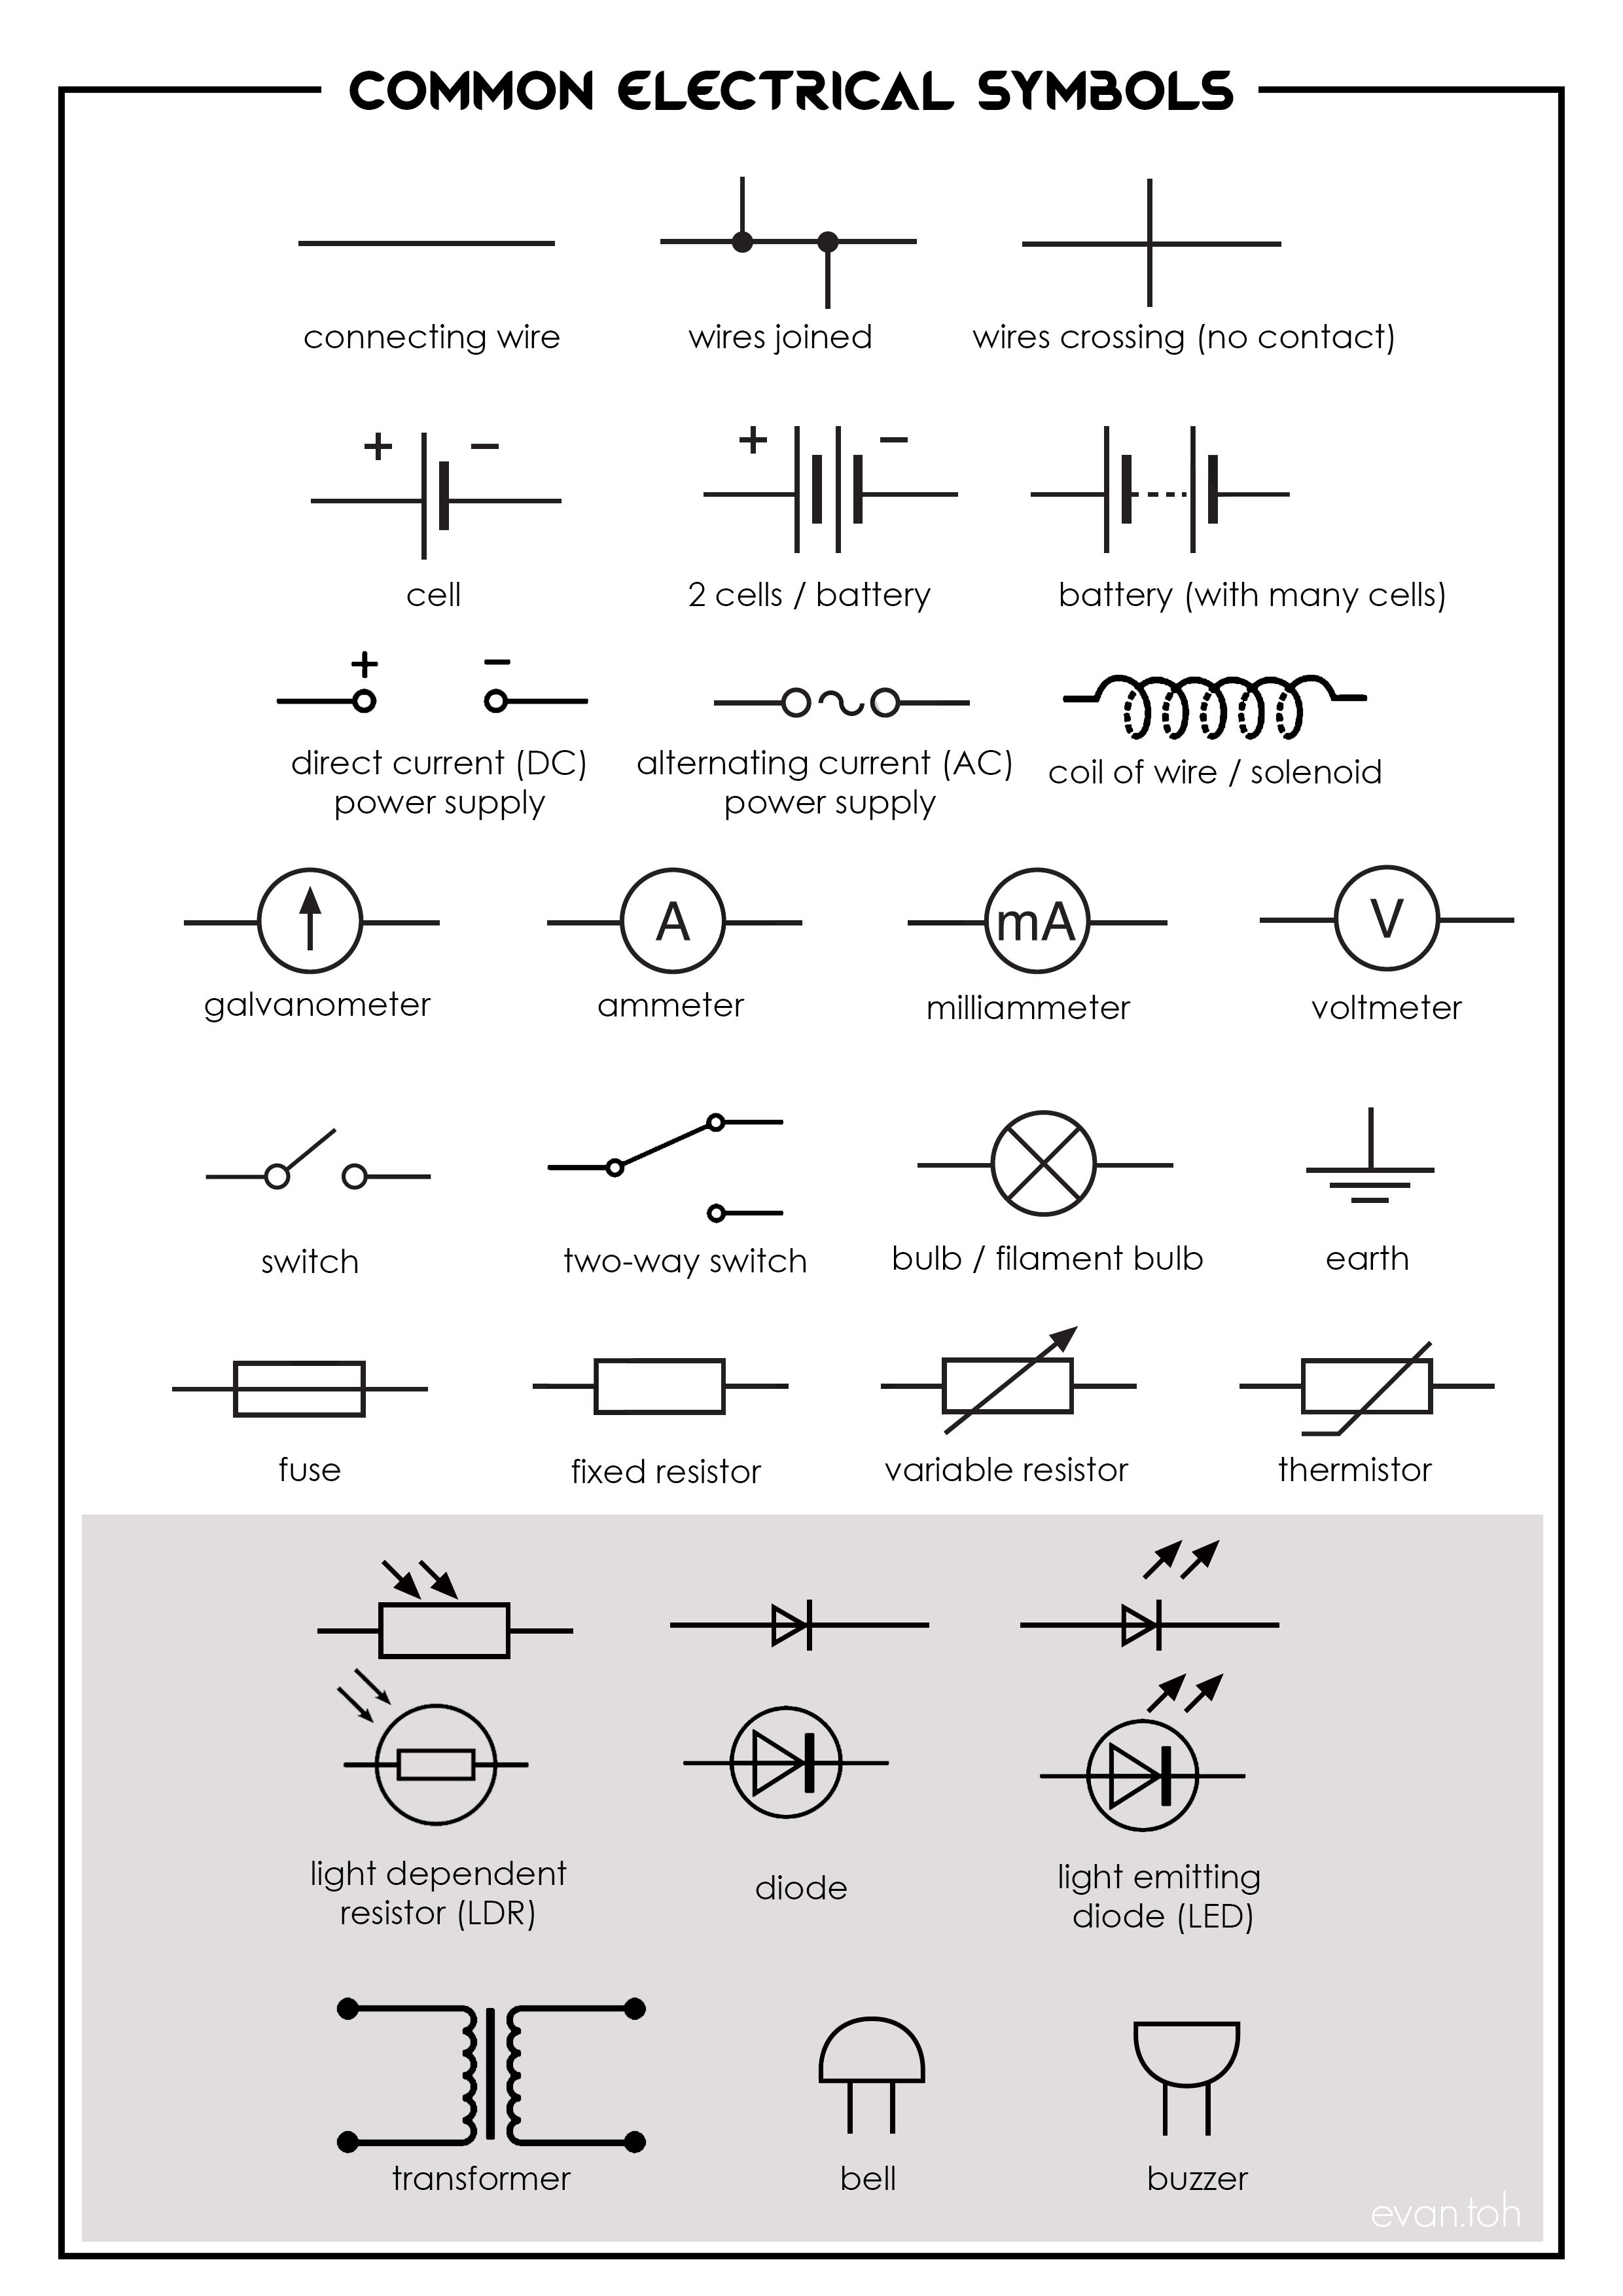 hight resolution of common electrical symbols evan u0027s spacedc wiring symbols 4